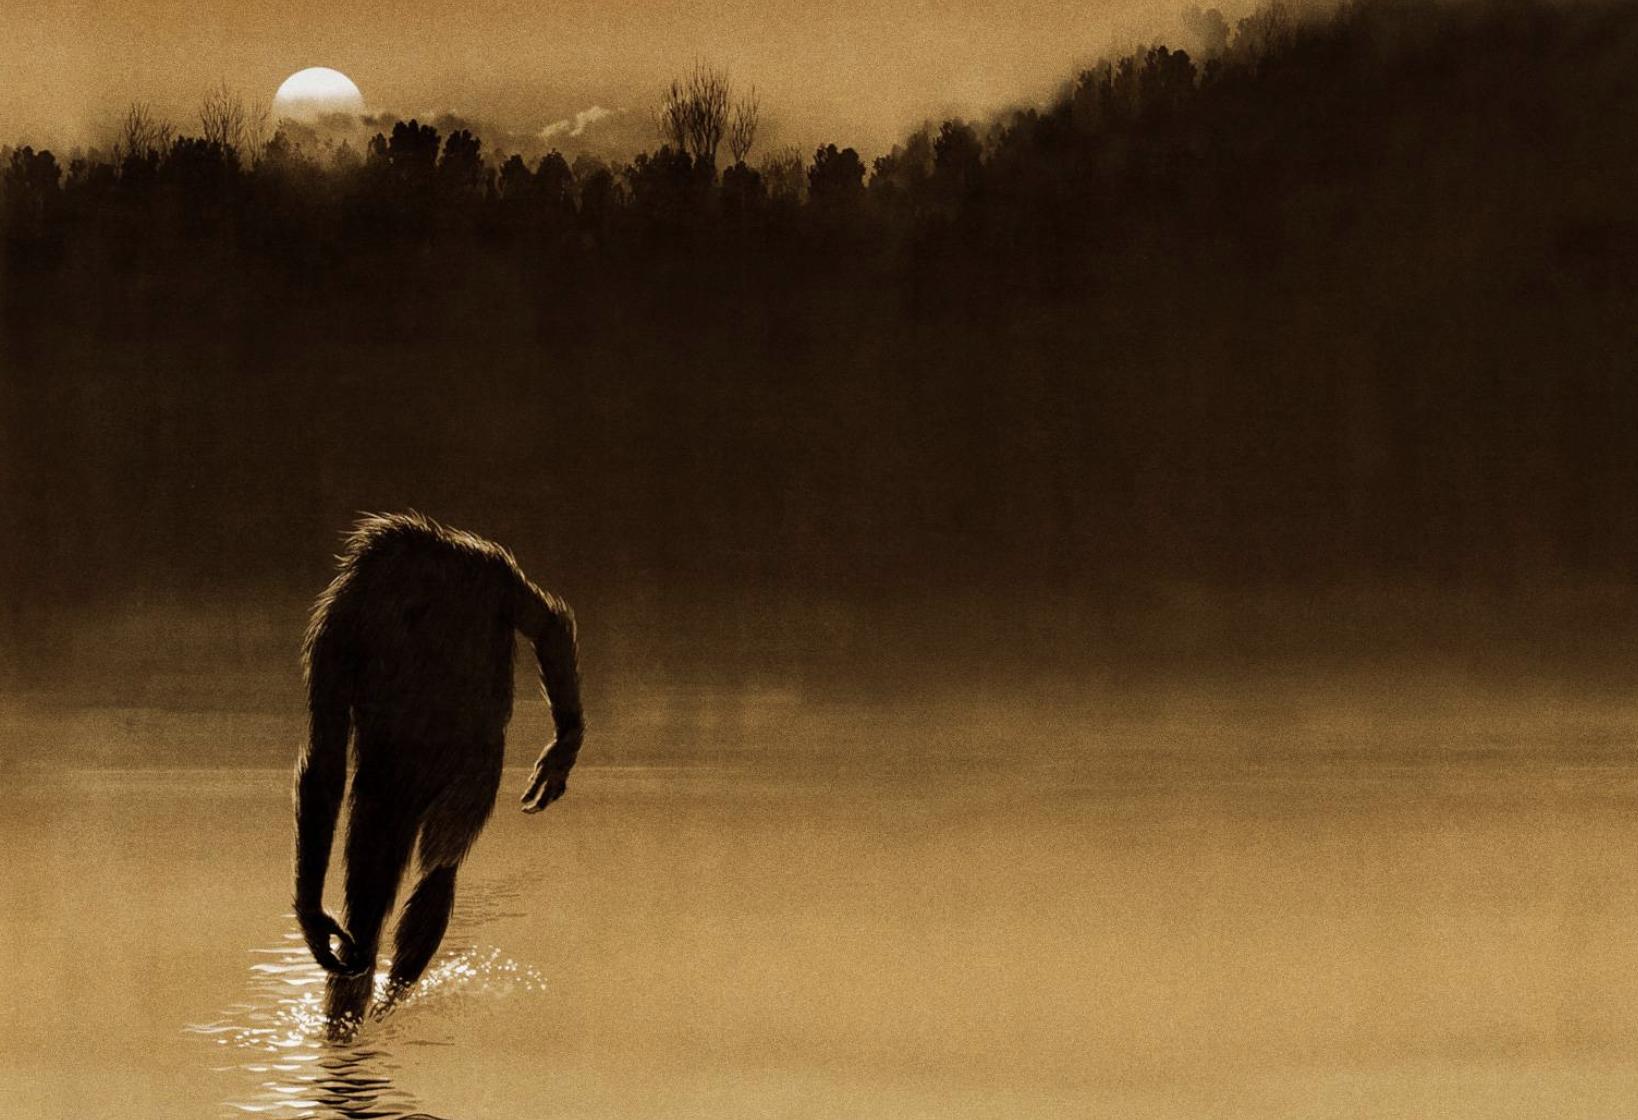 Fouke Monster artwork from  The Legend of Boggy Creek  film